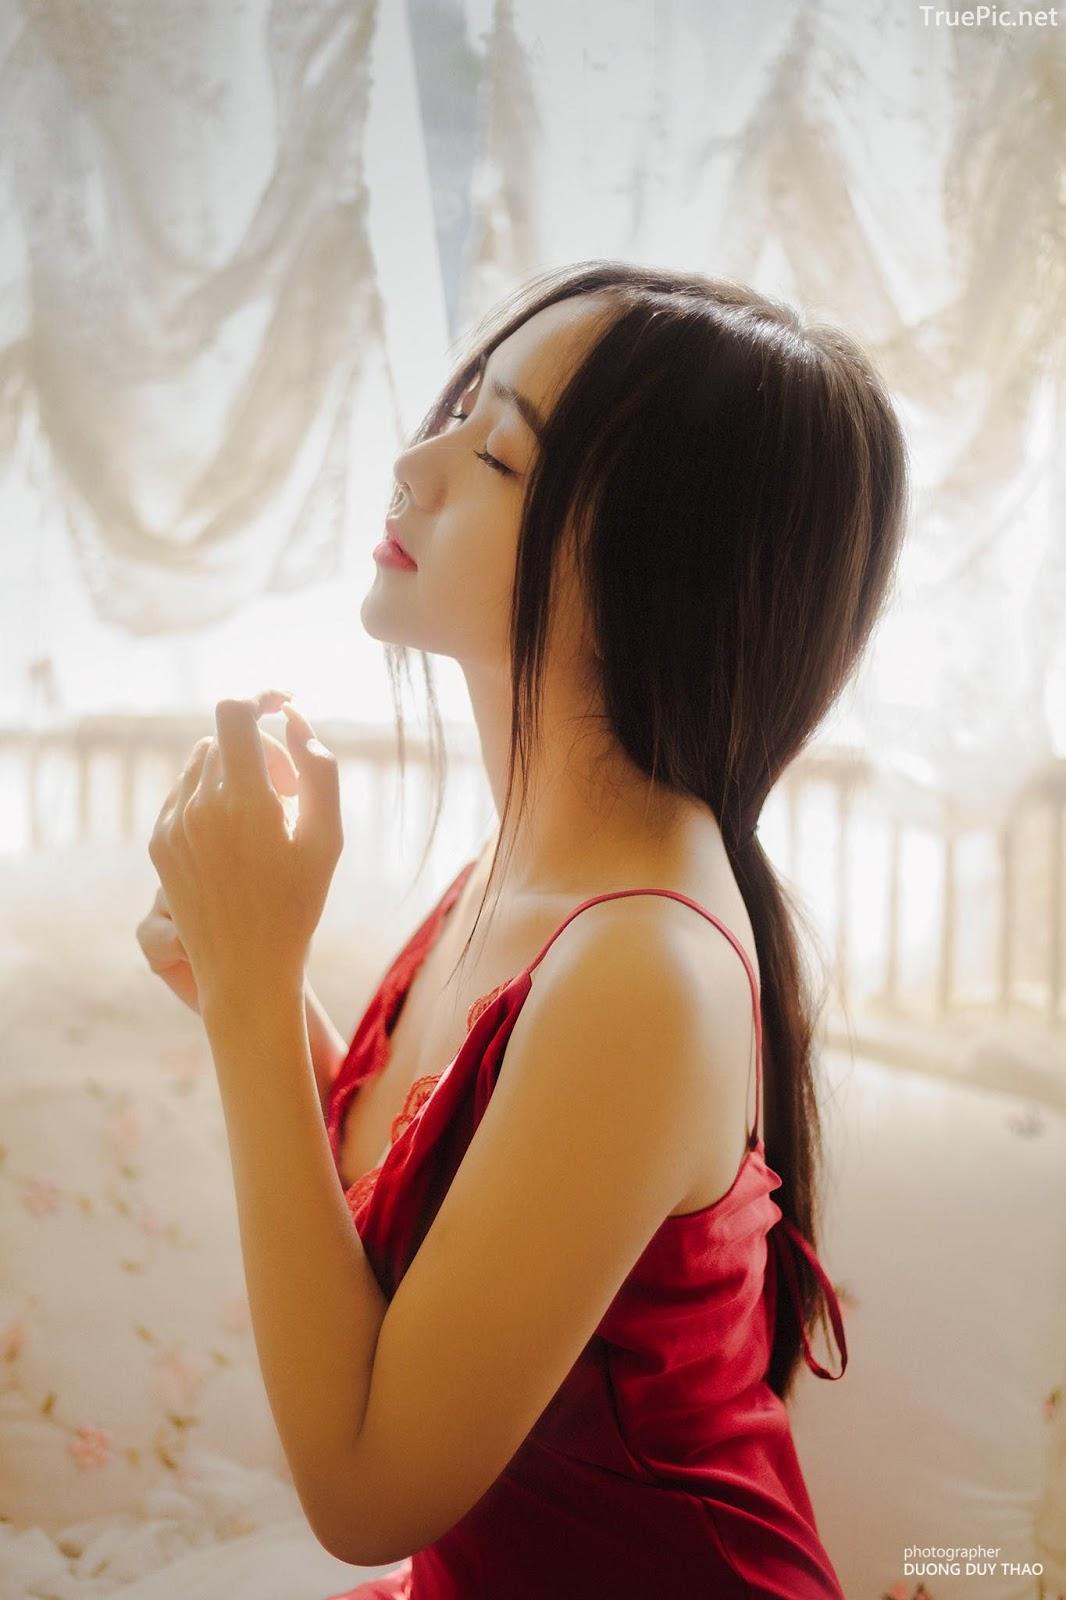 Vietnamese hot girl model Hua Thao Nguyen - She is a beautiful butterfly - Picture 10